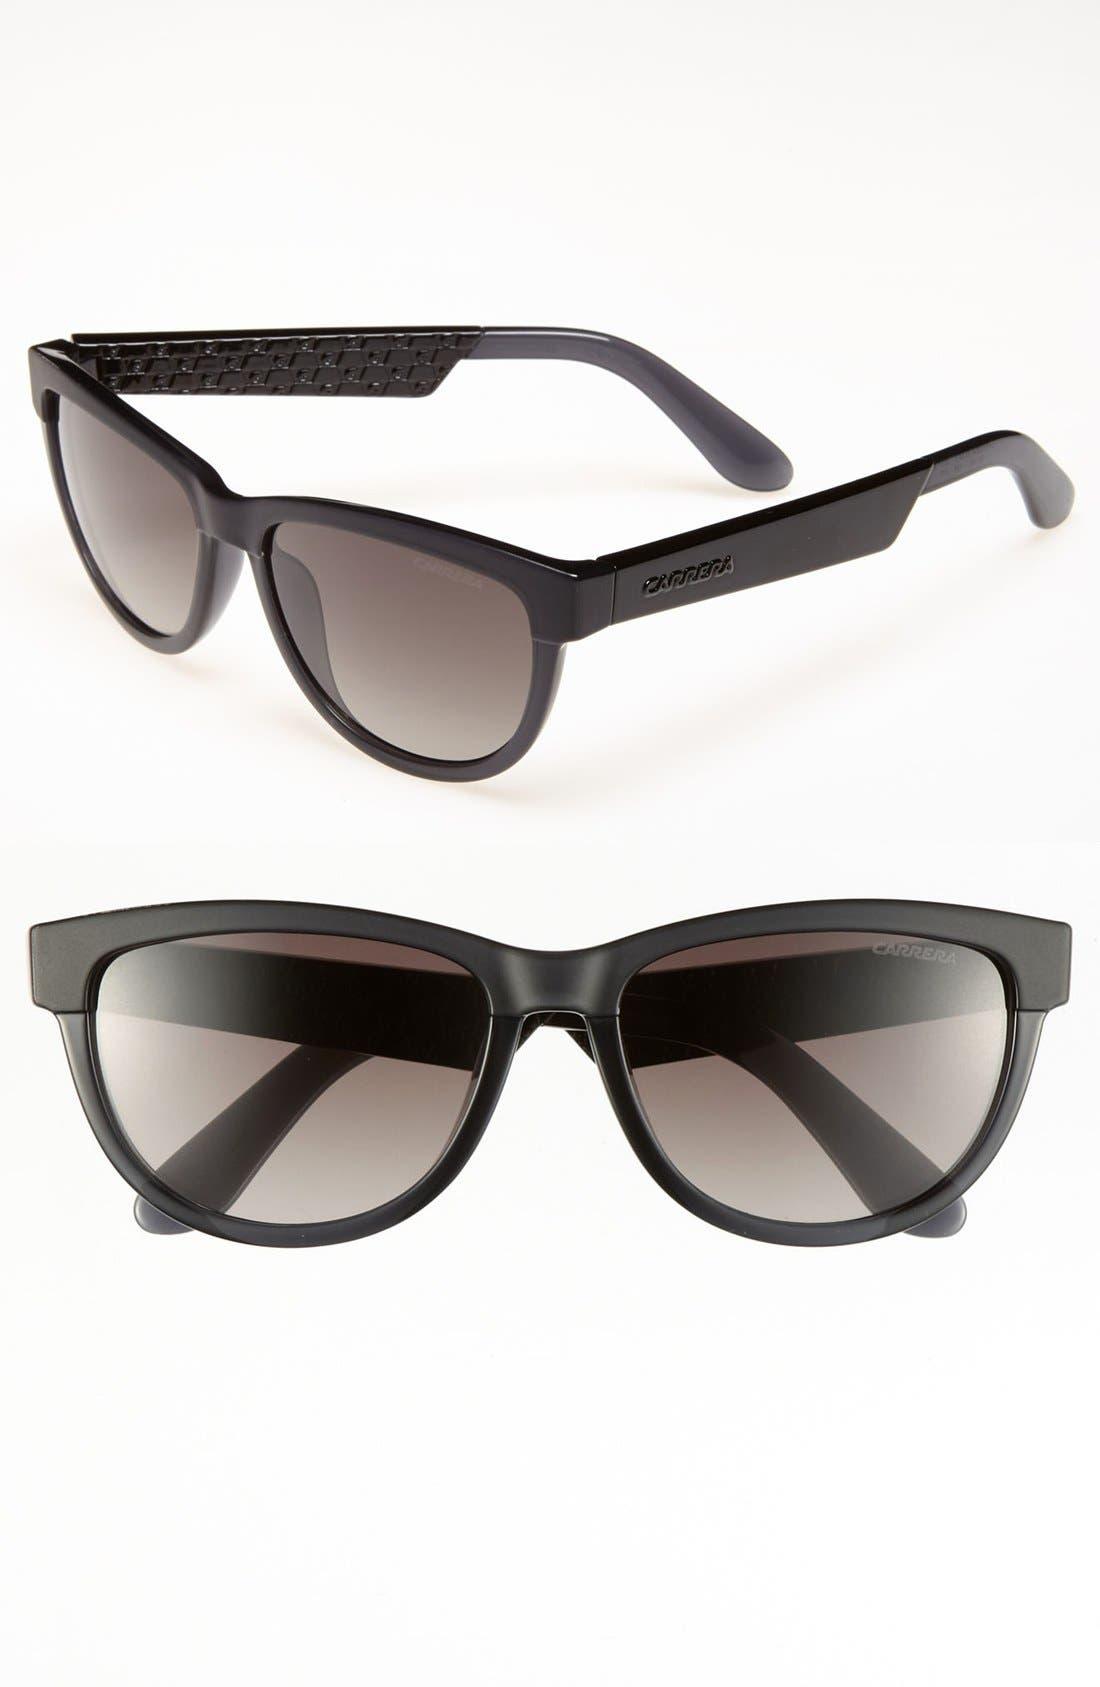 55mm Sunglasses,                         Main,                         color, 020